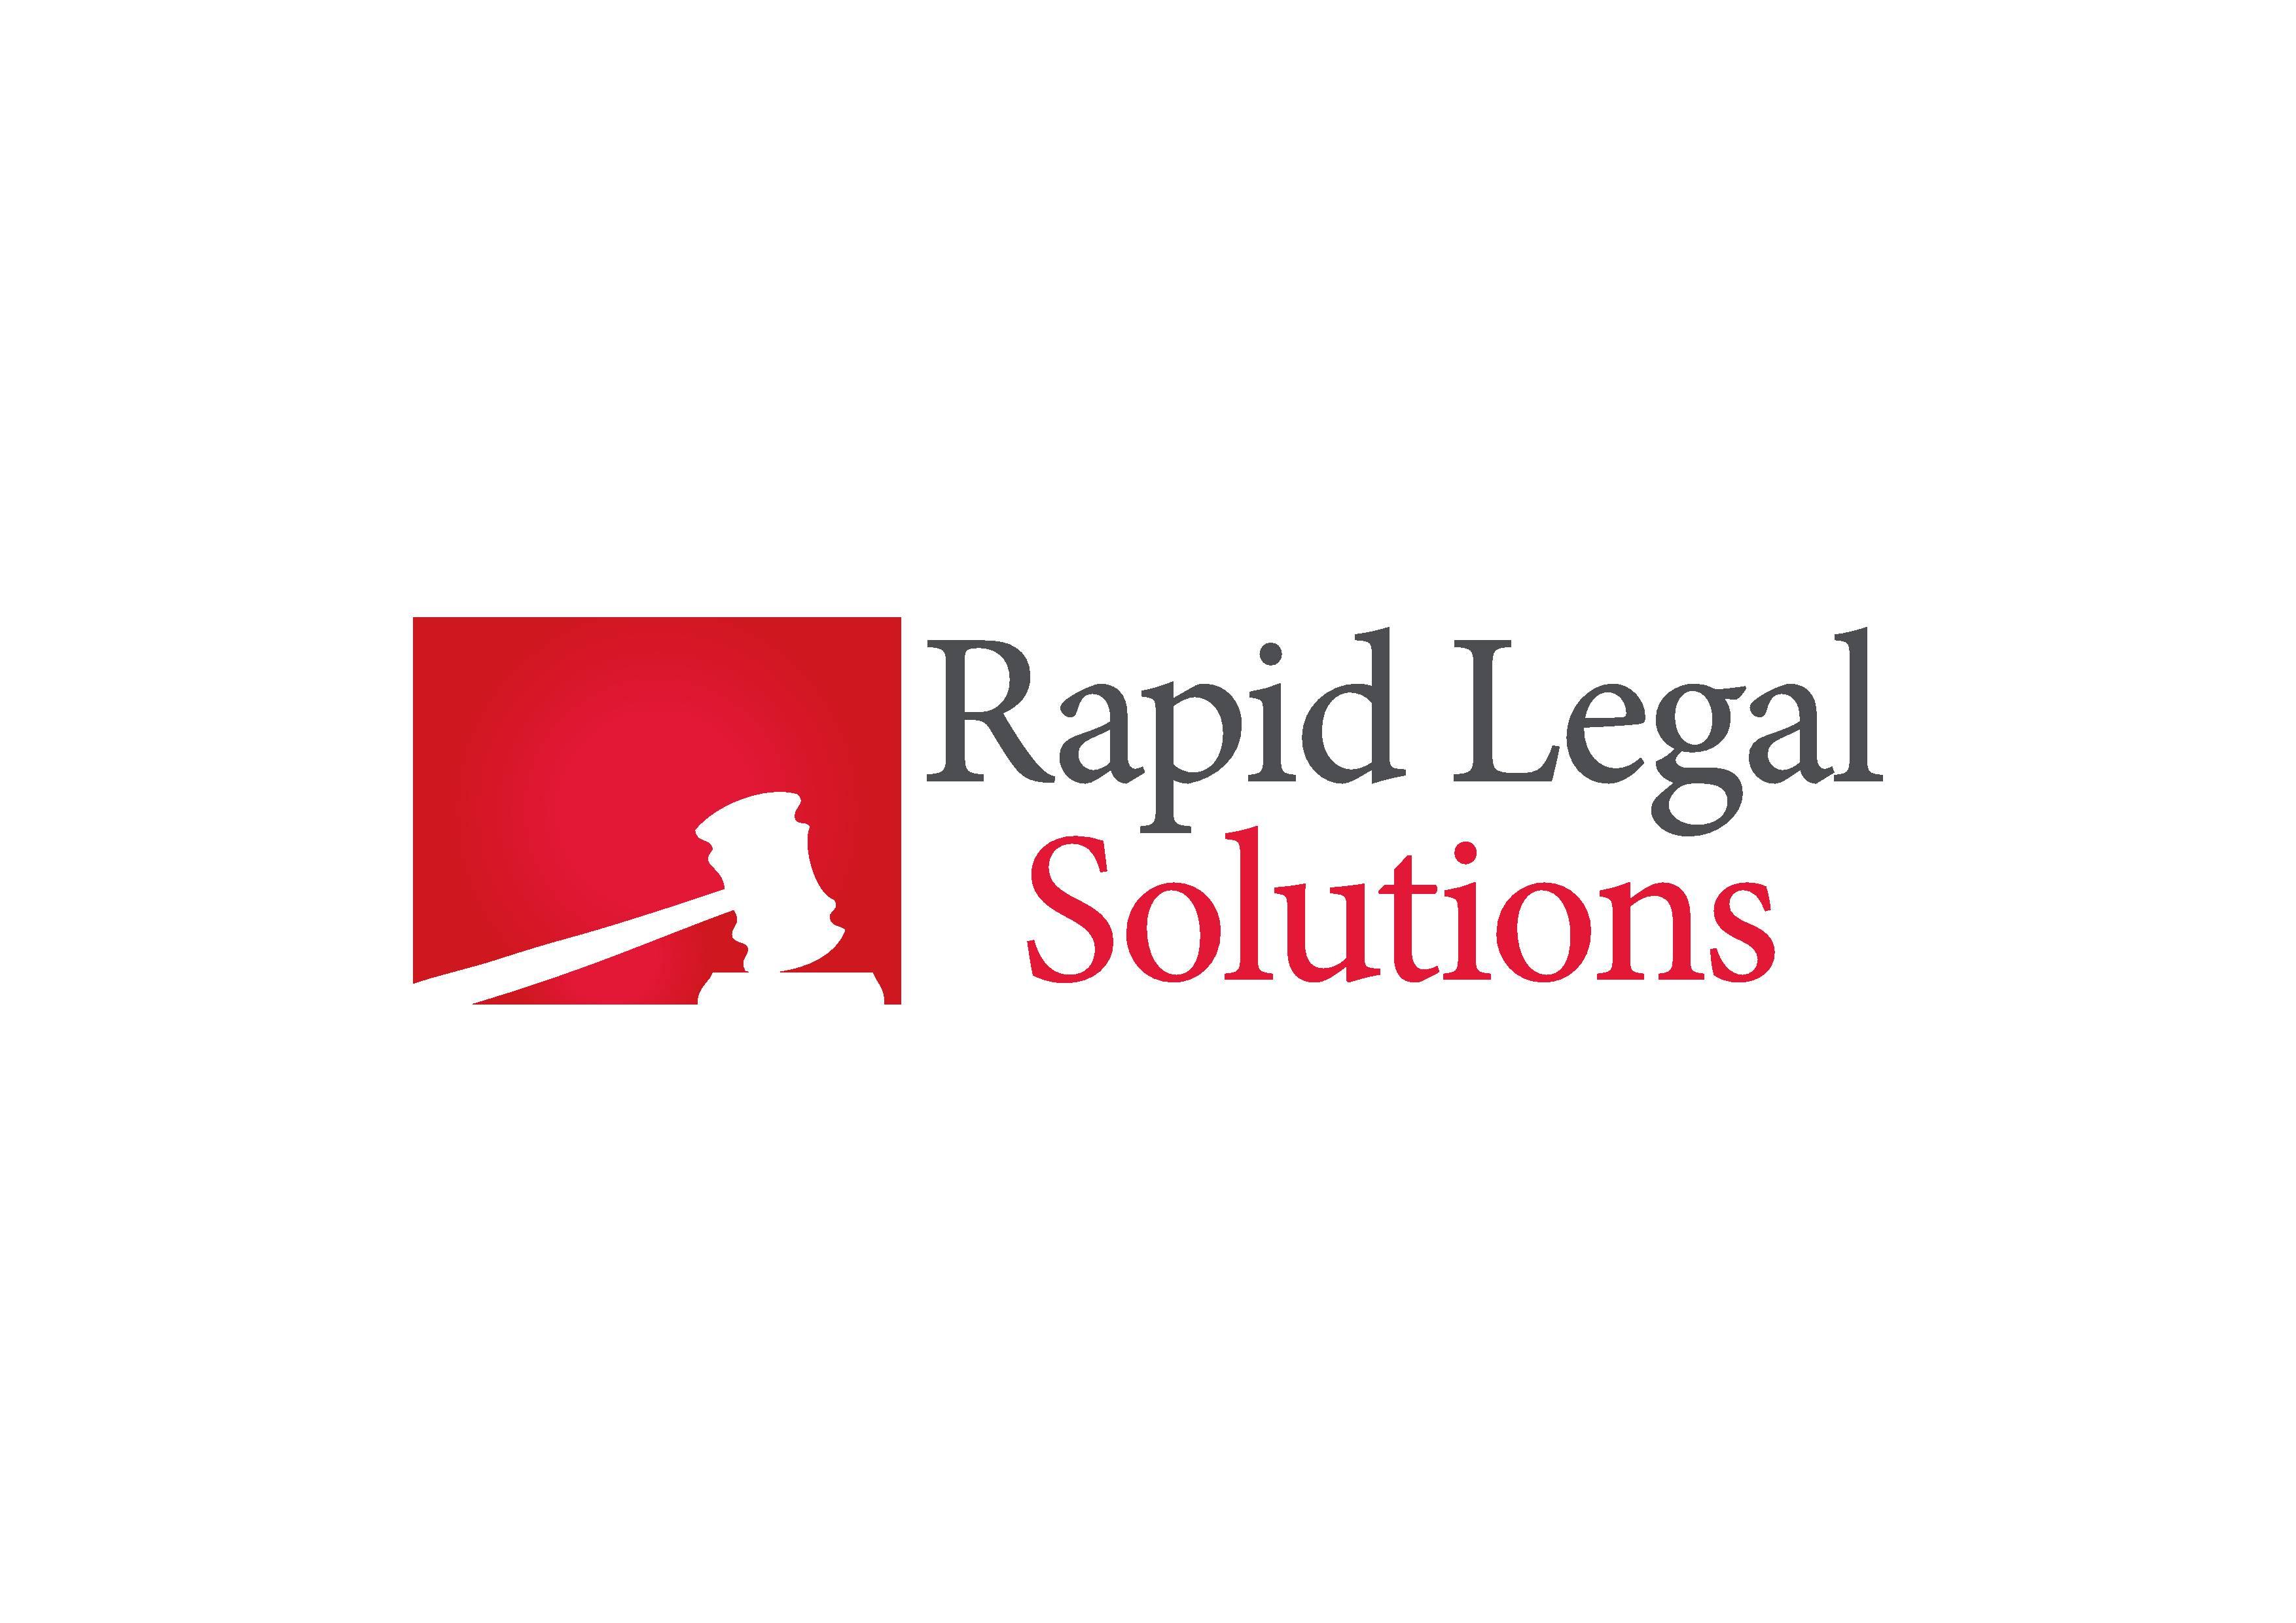 Rapid Legal Solutions